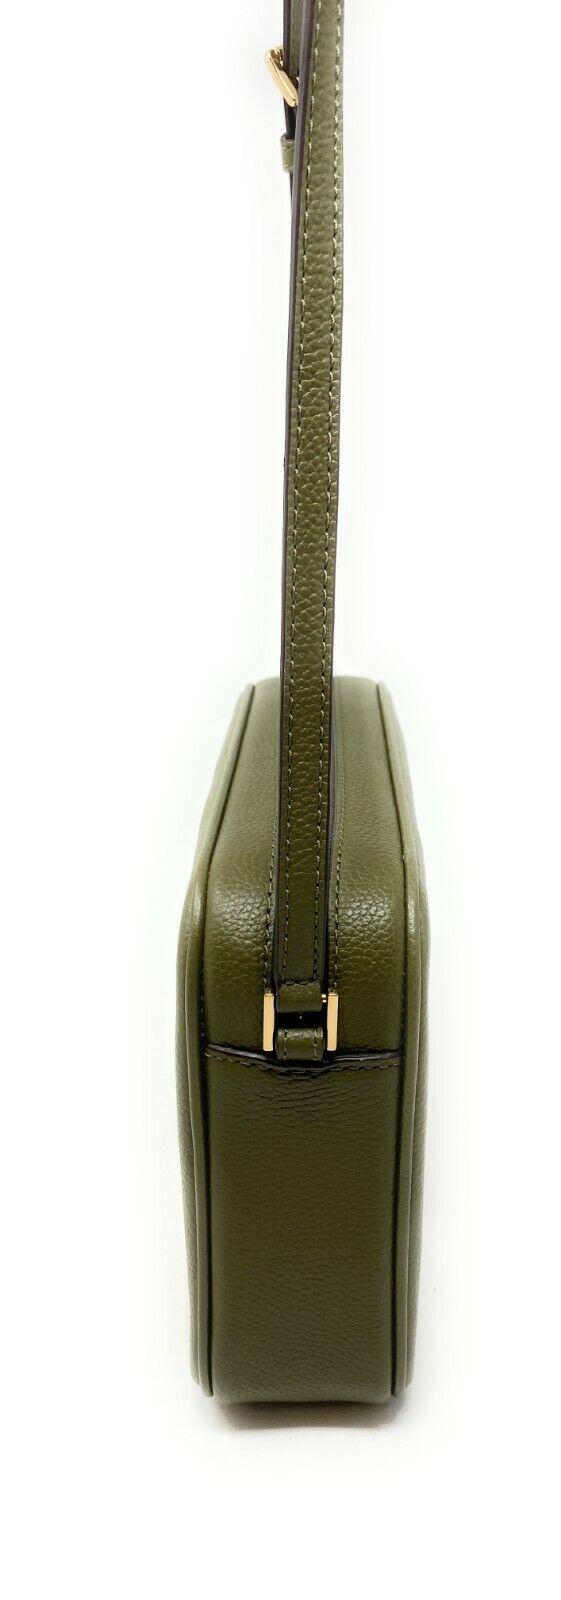 thumbnail 46 - Michael Kors Jet Set Item Large East West Crossbody Chain Handbag Clutch $298